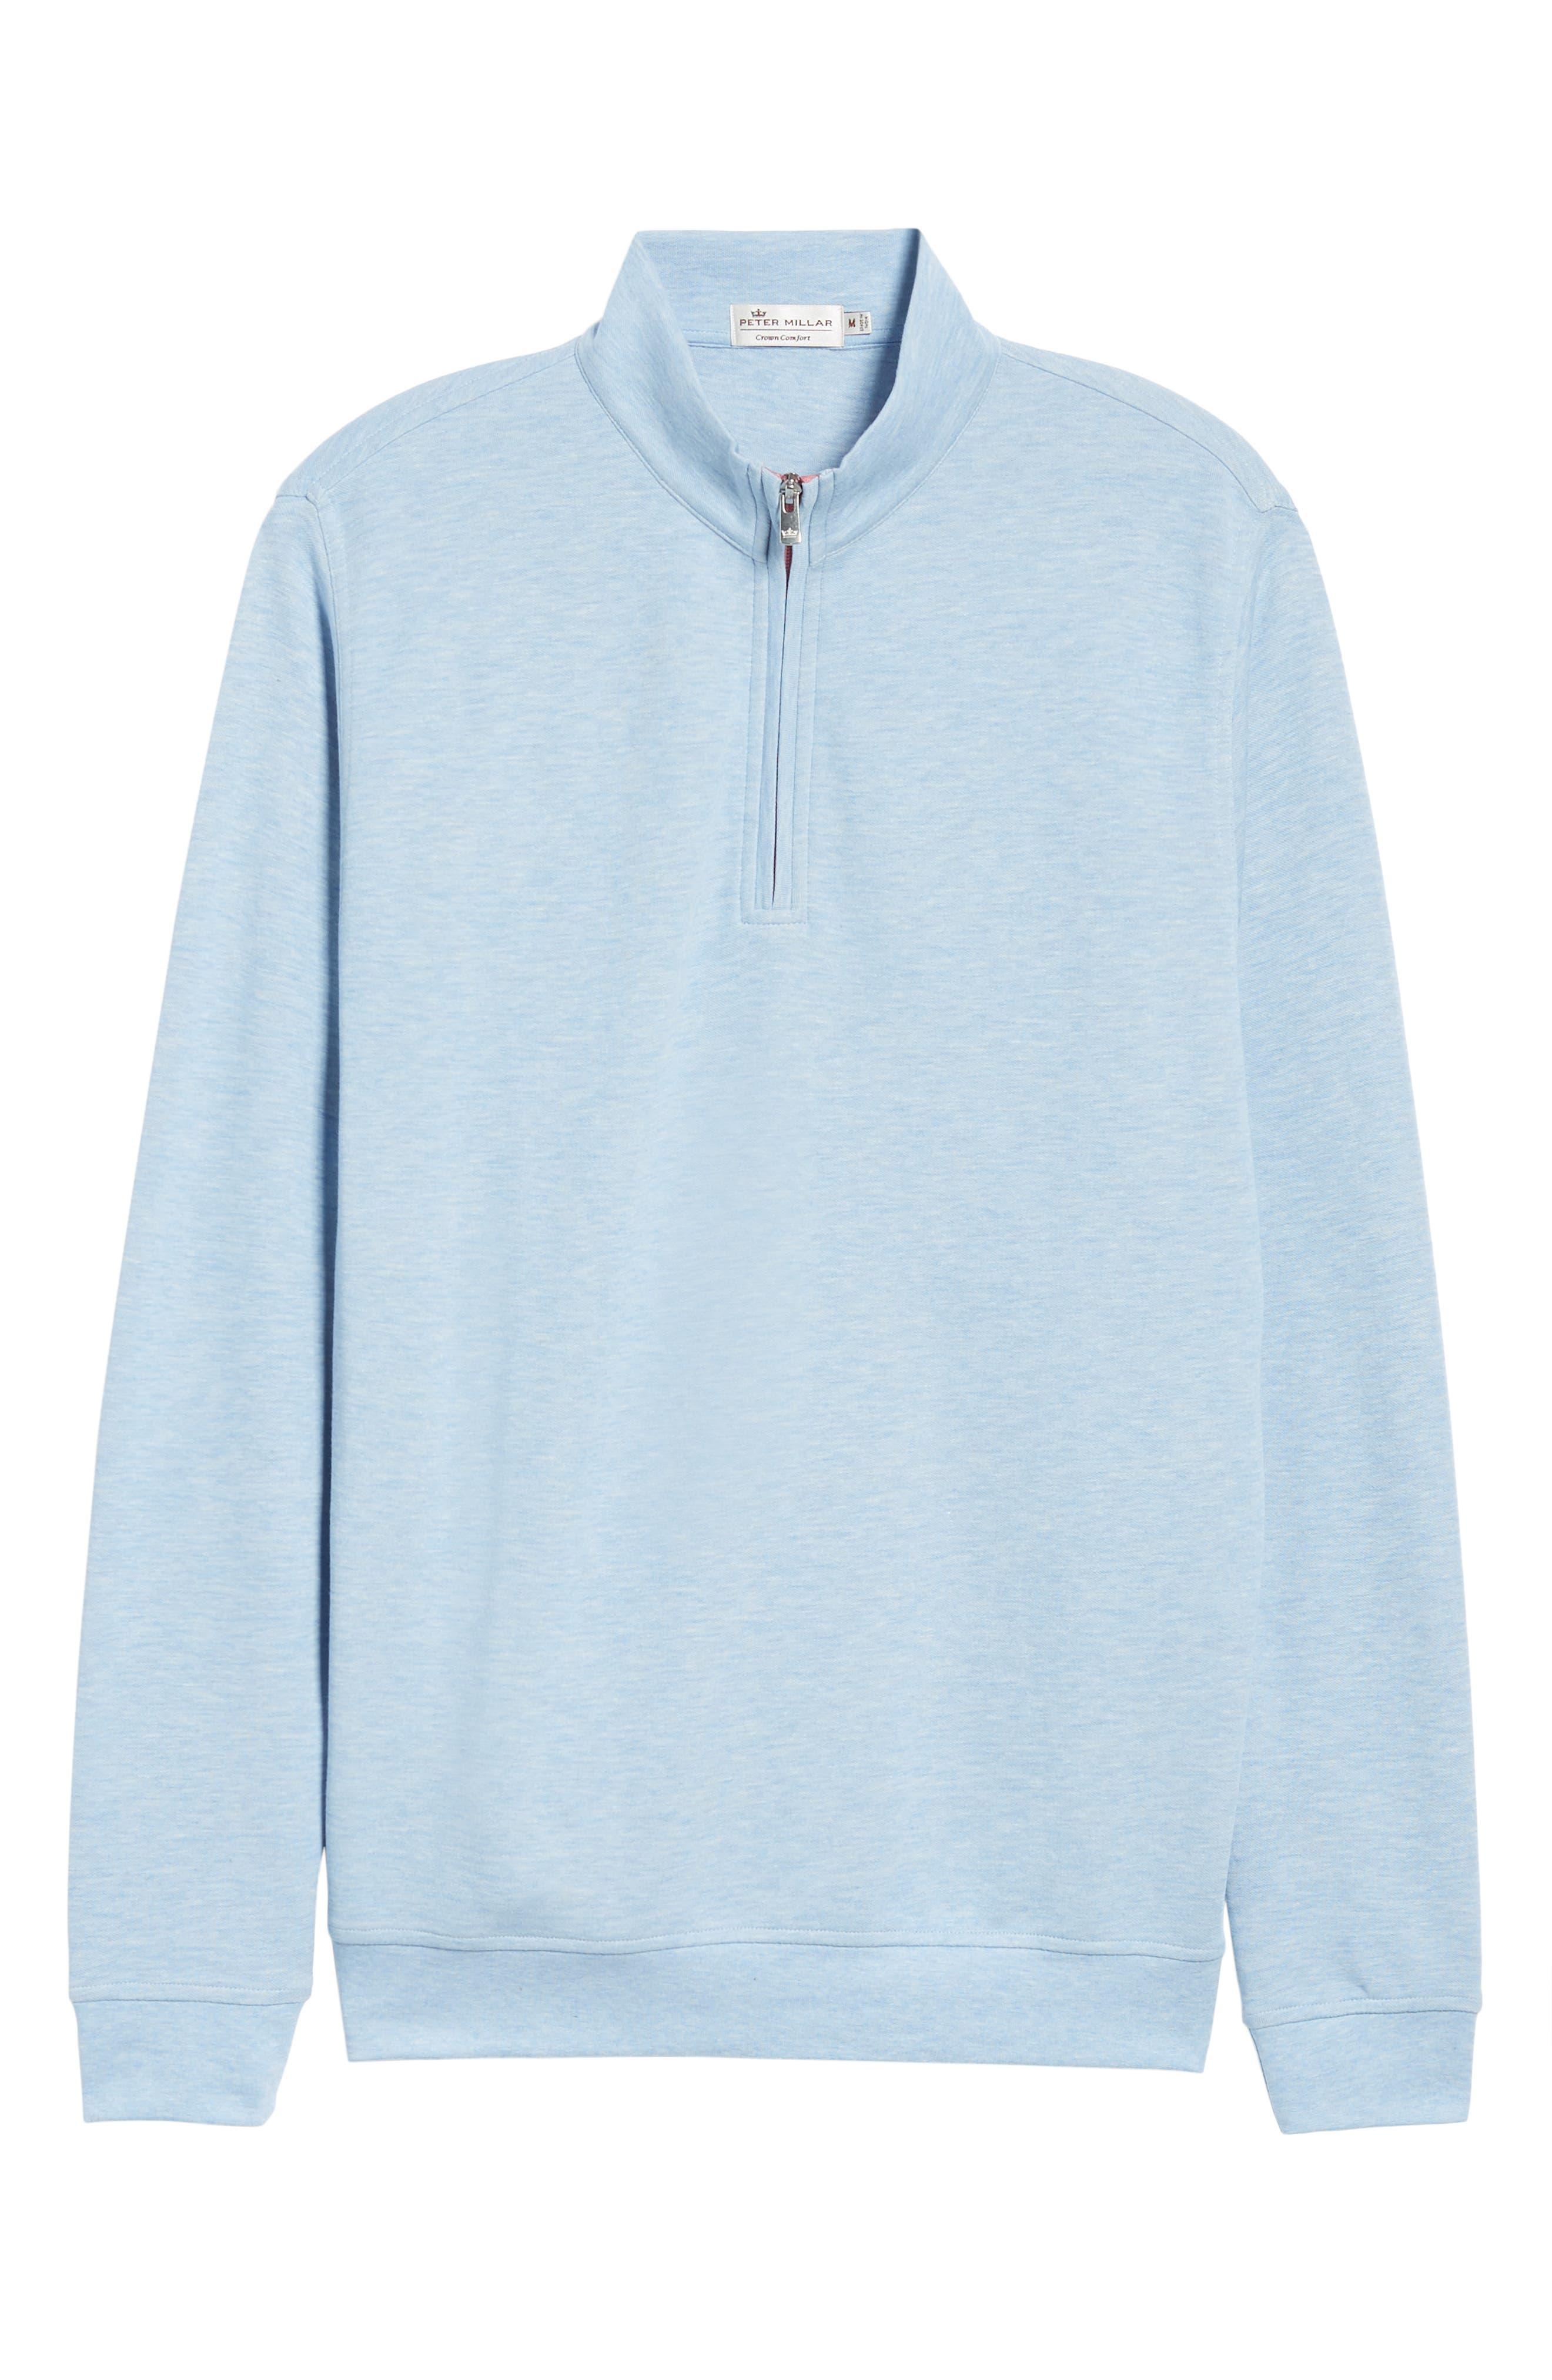 Crown Comfort Jersey Quarter Zip Pullover,                             Alternate thumbnail 6, color,                             COTTAGE BLUE